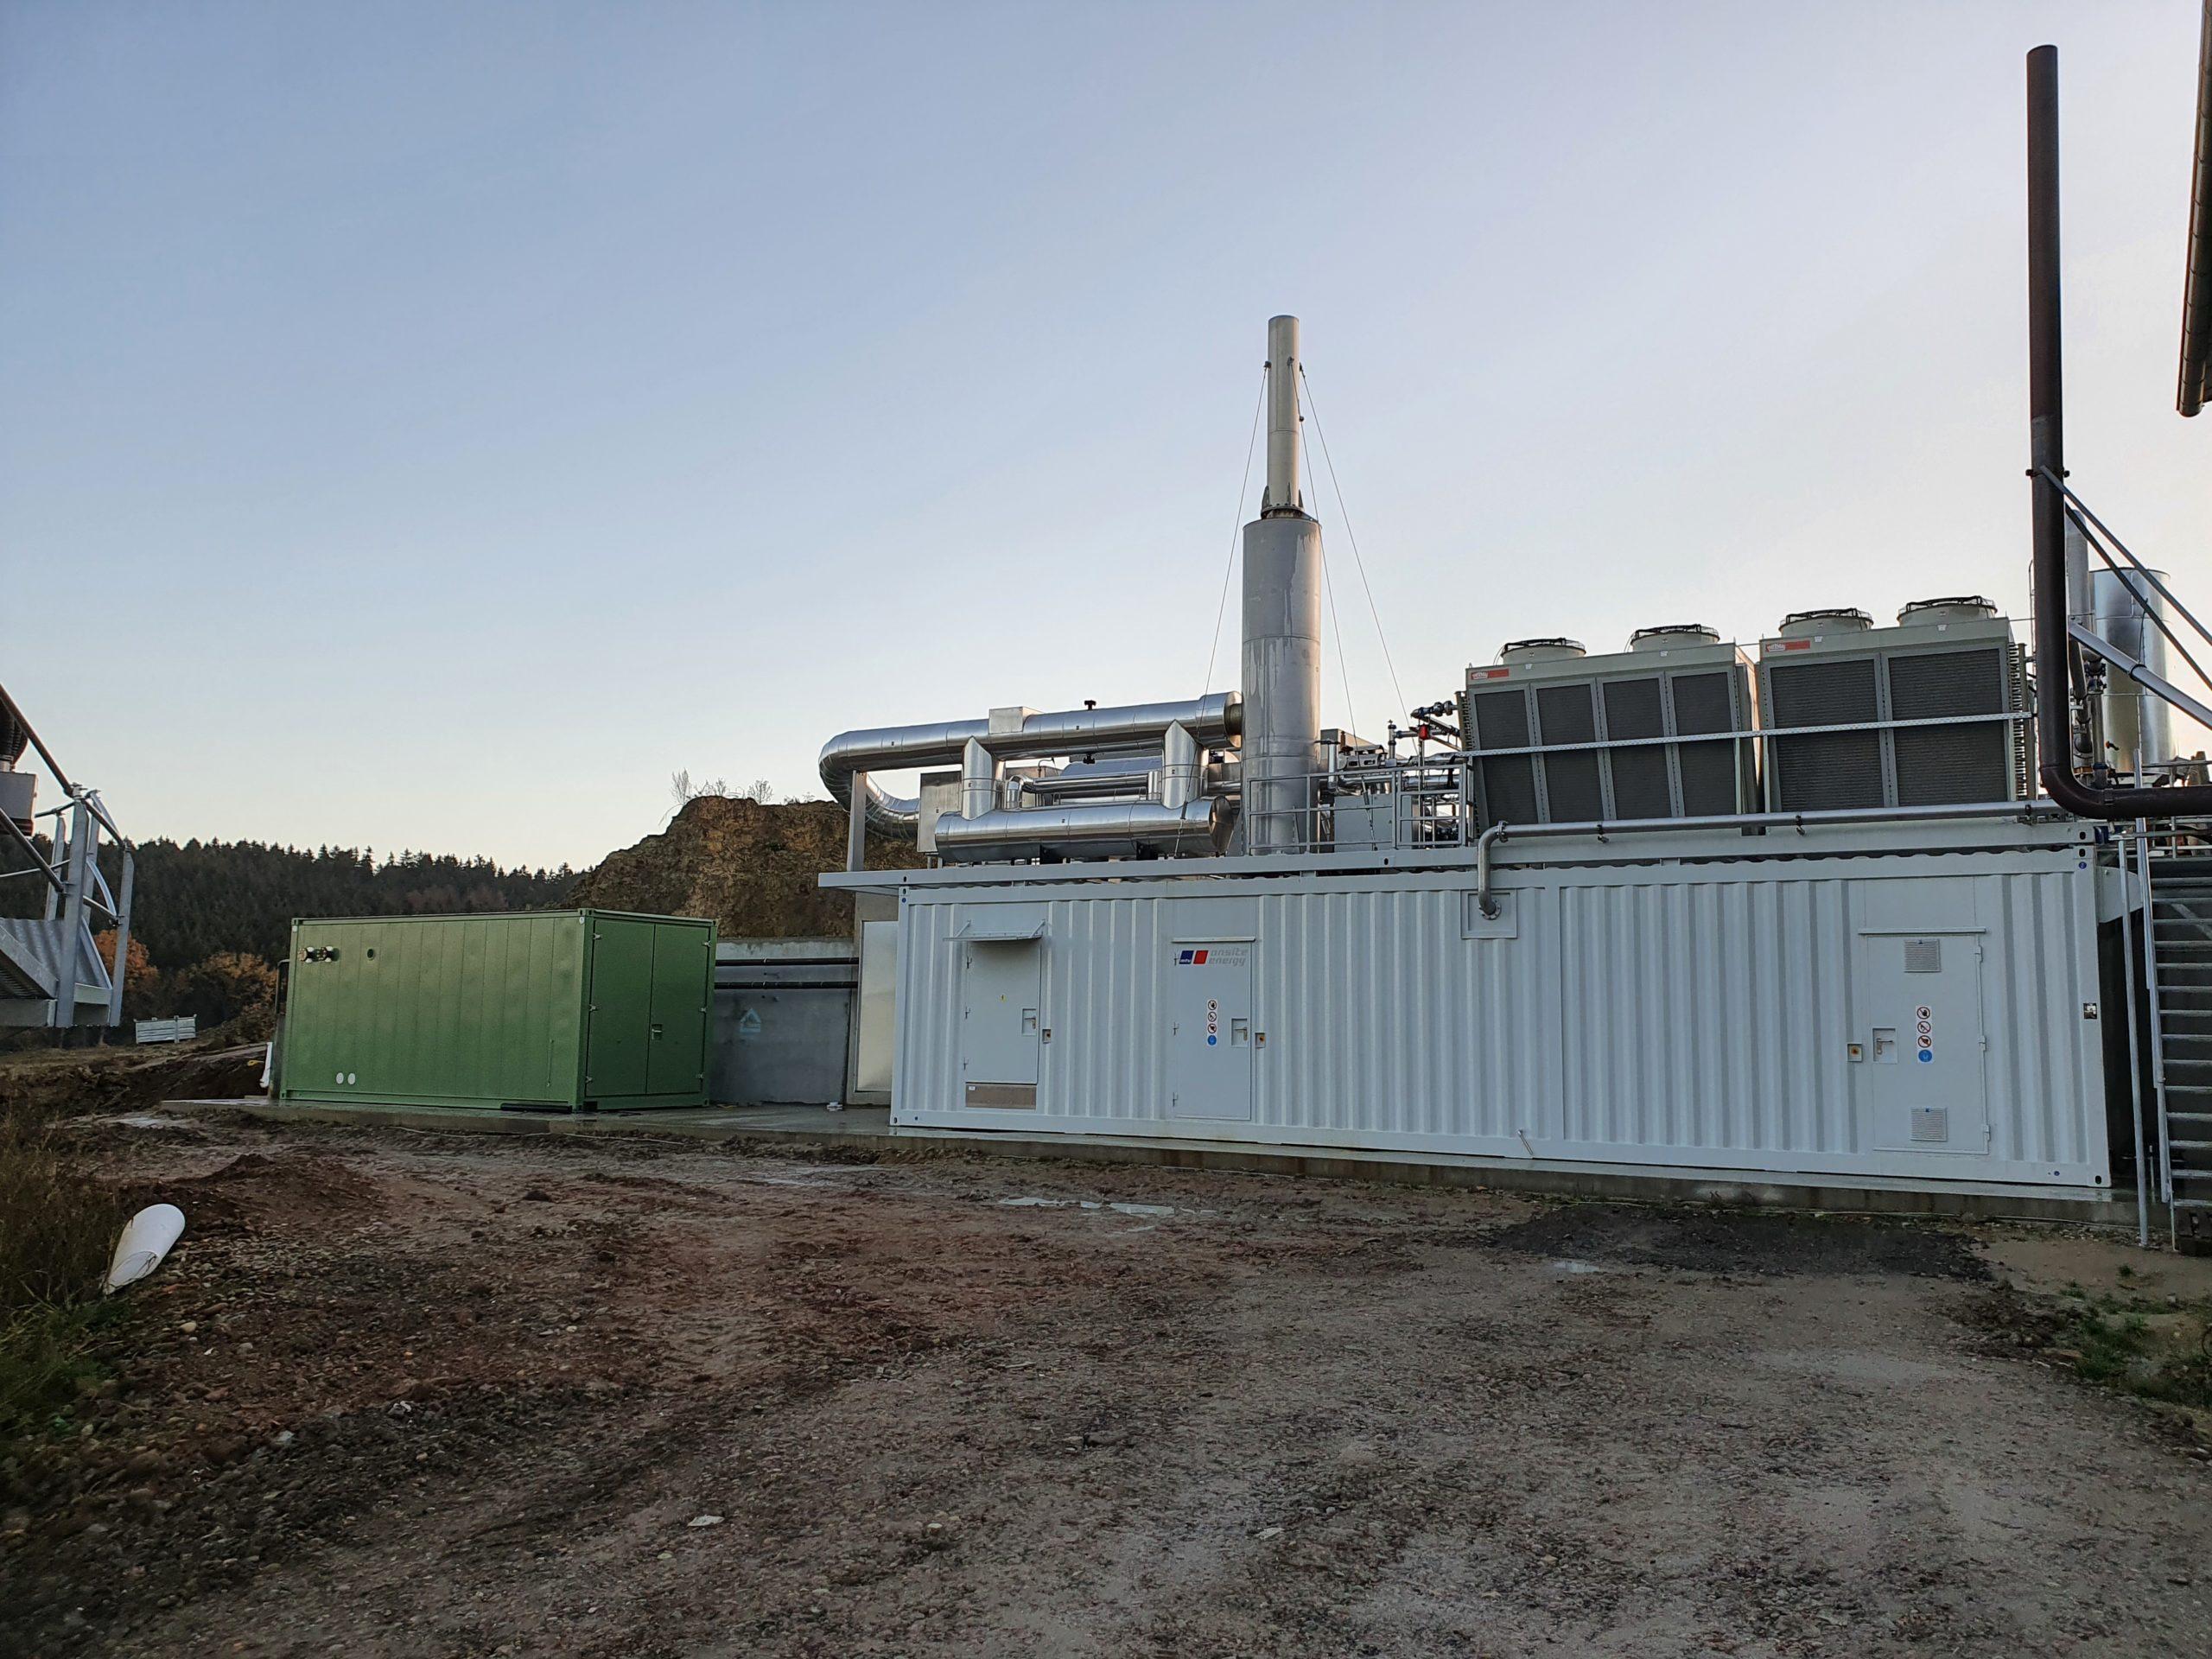 Energiezentrale Energiehof Thanner GmbH & Co. KG